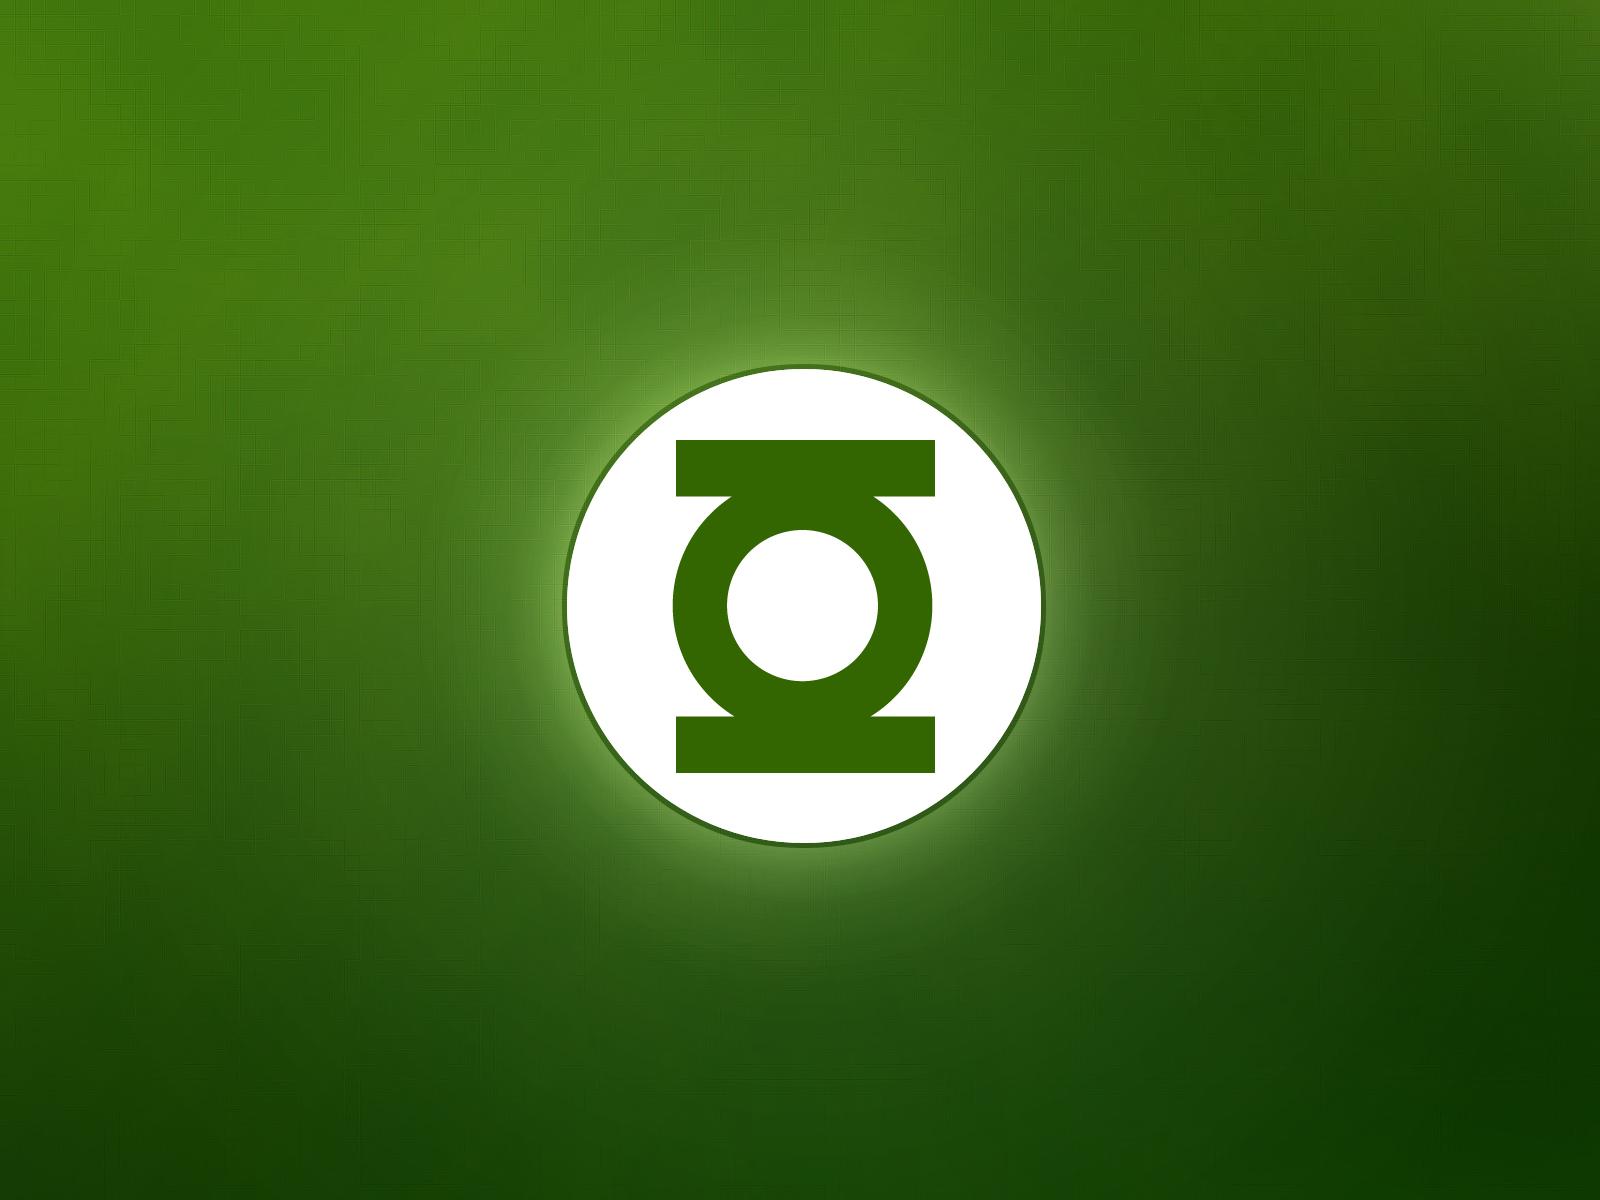 green lantern 23542